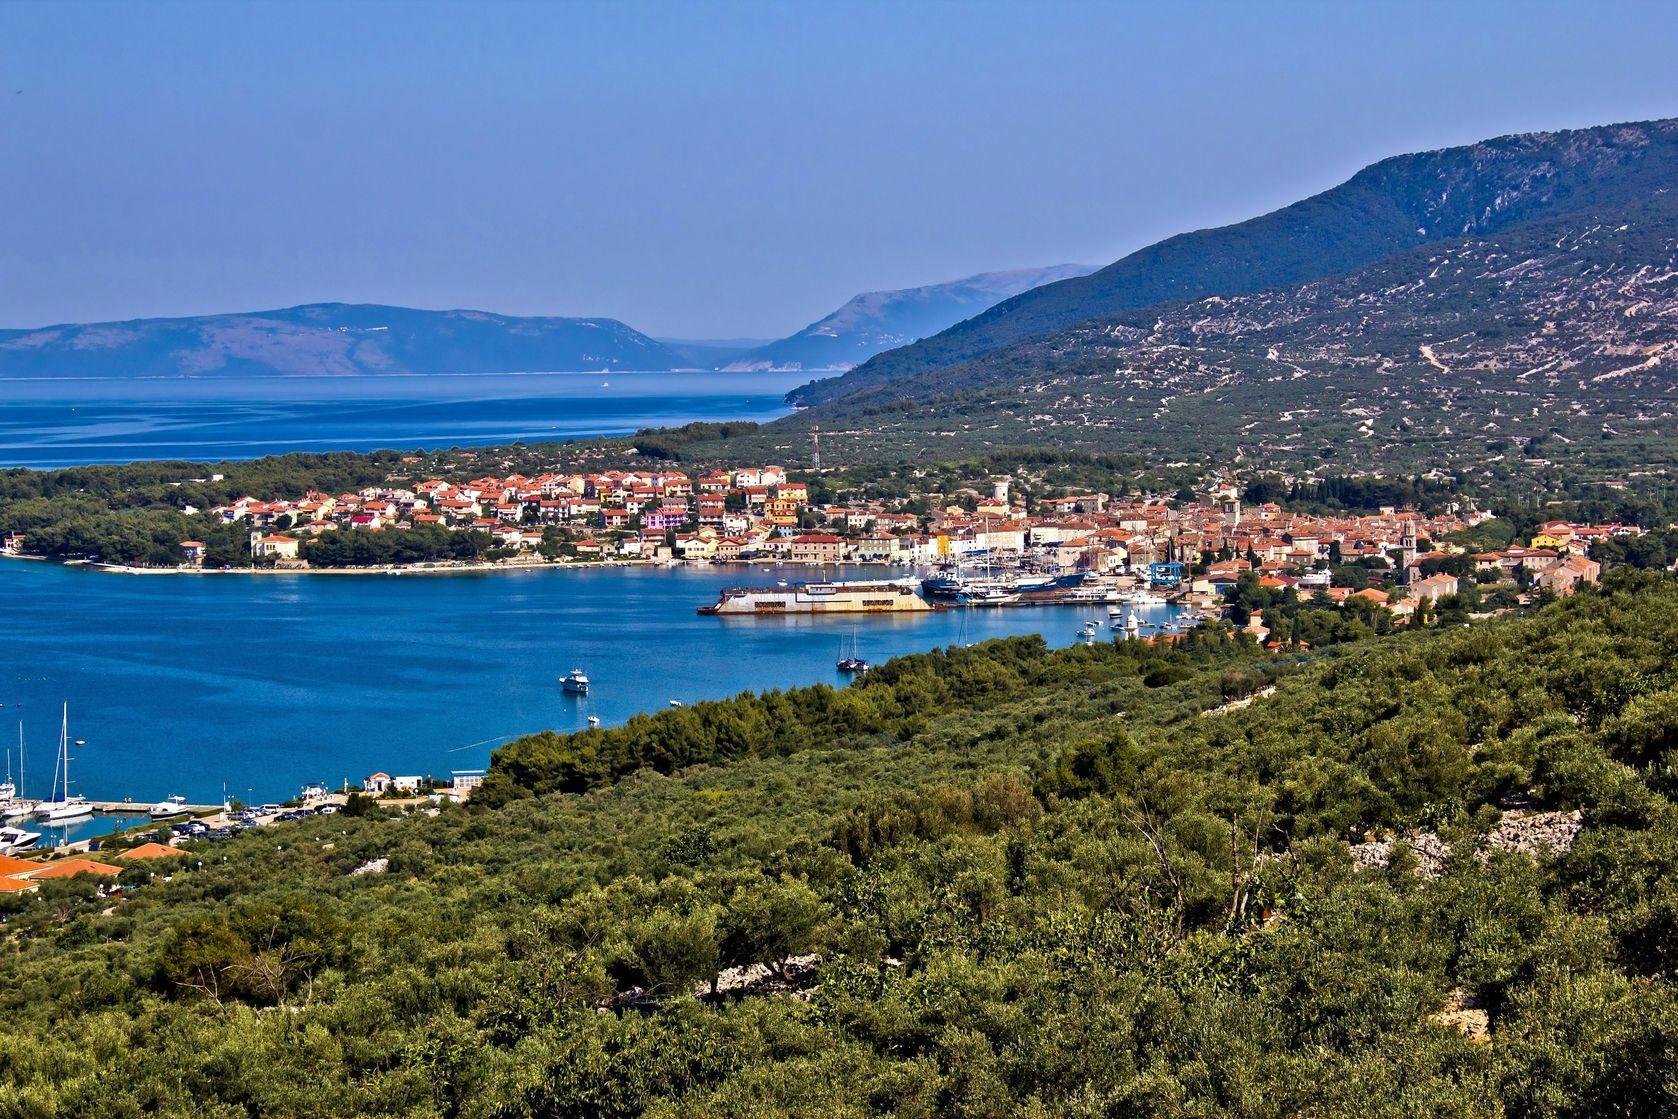 Pohled na Cres v Chorvatsku | xbrchx/123RF.com